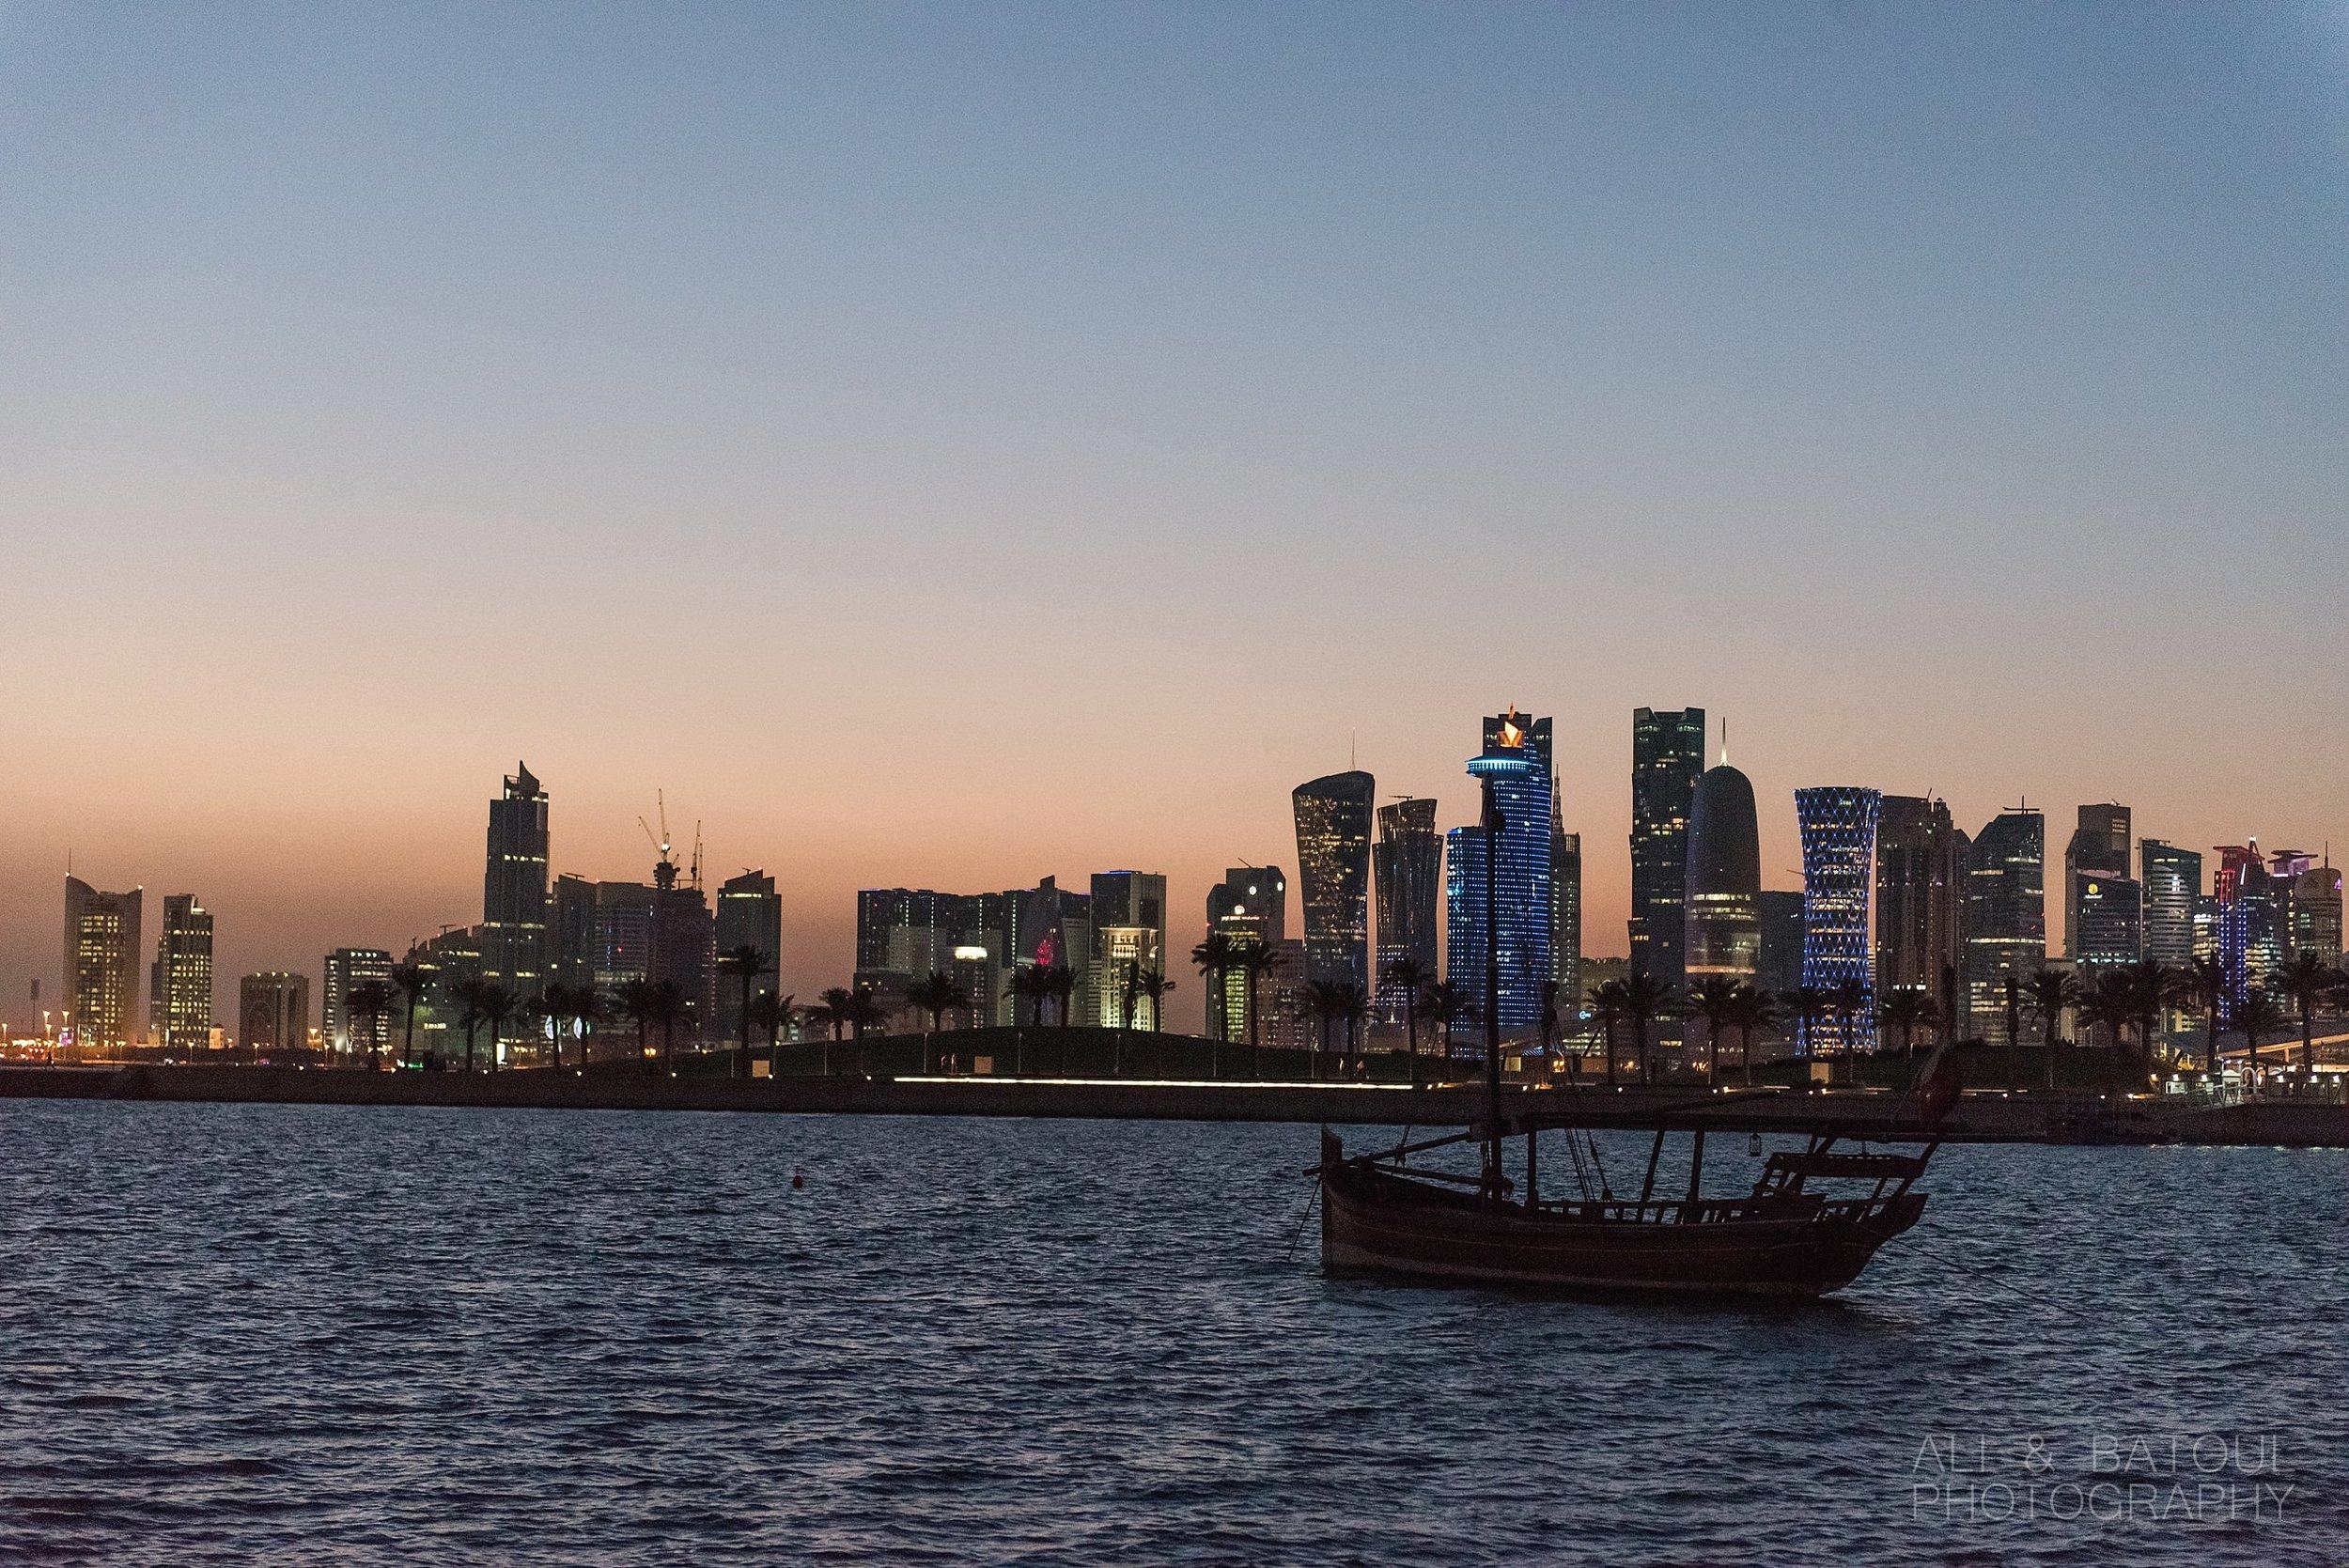 Ali & Batoul Photography - Doha Travel Photography_0057.jpg